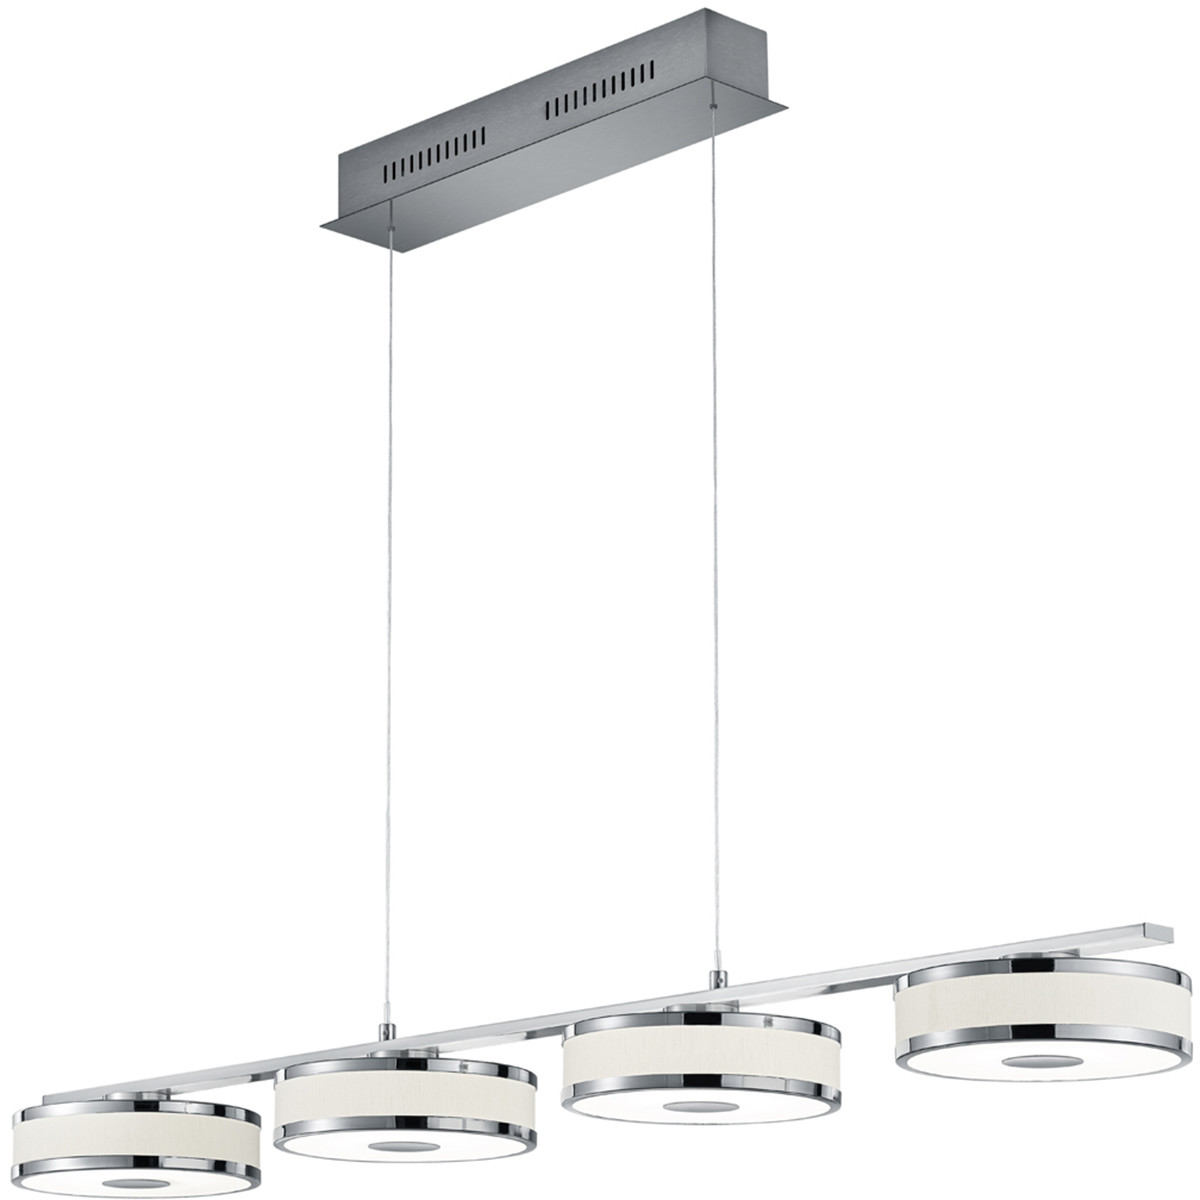 LED Hanglamp - Trion Agiany - 28W - Warm Wit 3000K - 4-lichts - Dimbaar - Rechthoek - Mat Nikkel - A